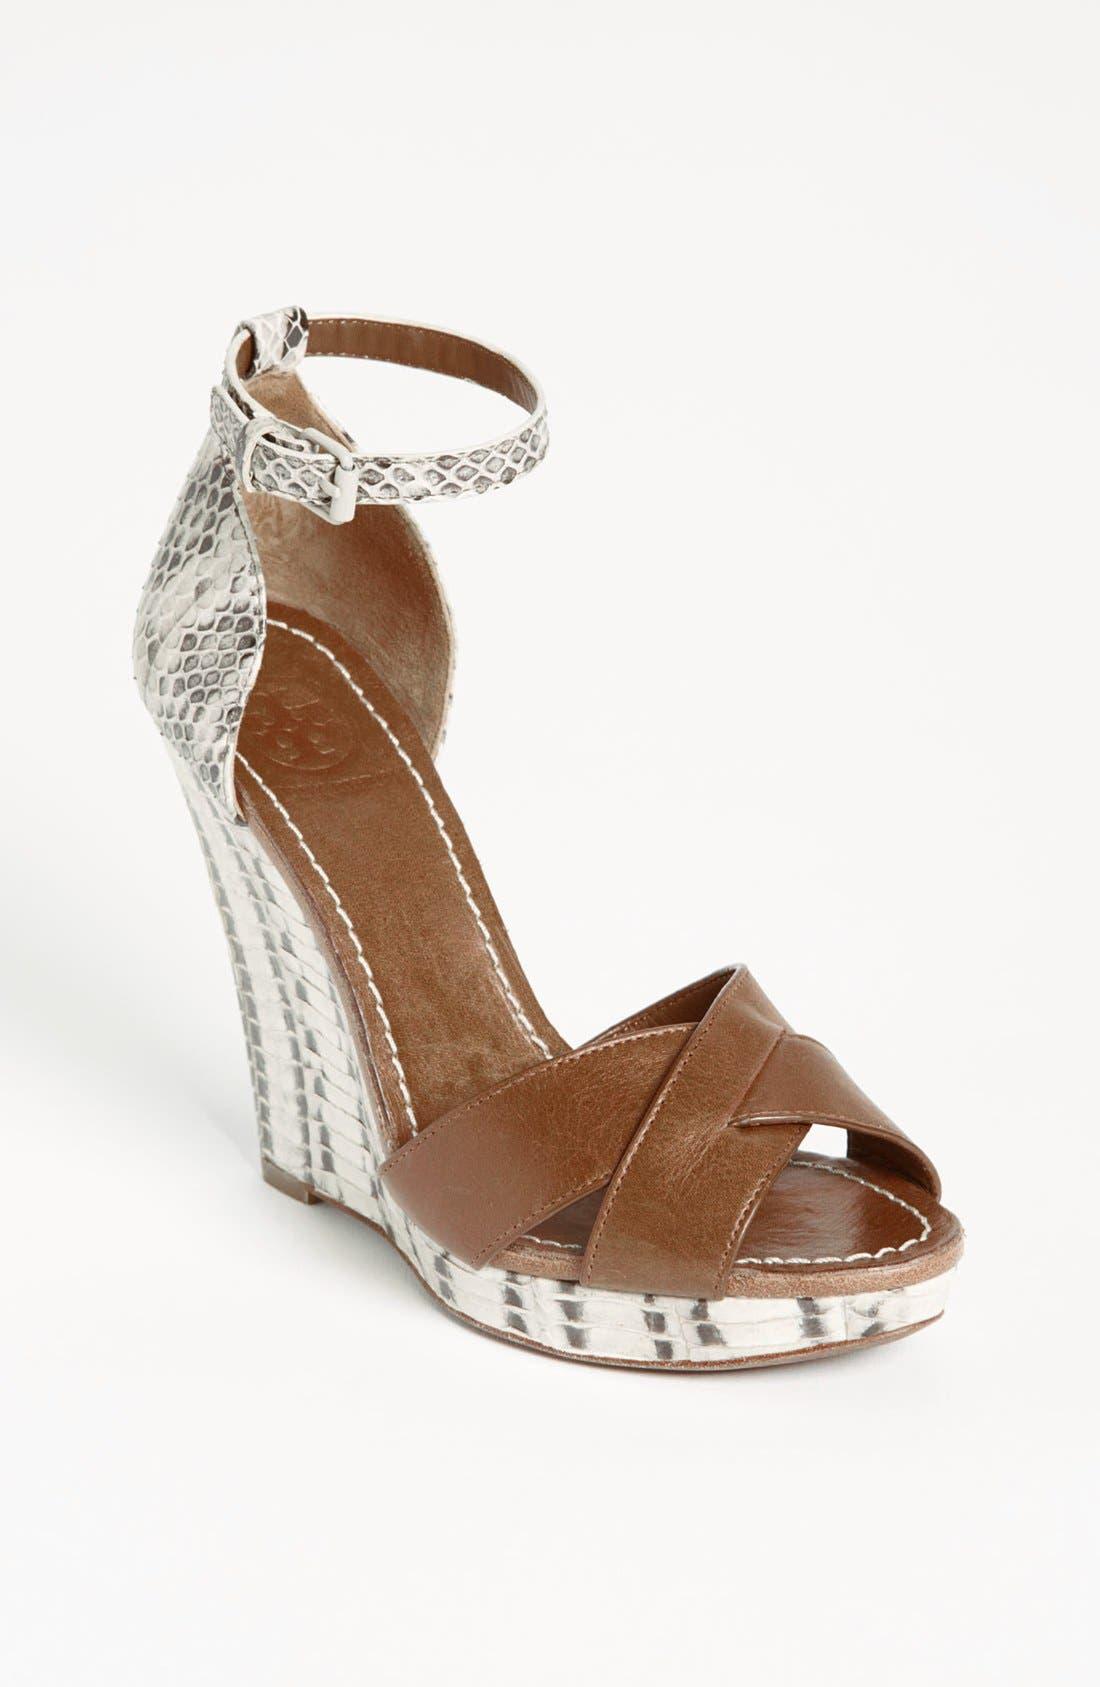 Alternate Image 1 Selected - Tory Burch 'Livia' Genuine Snakeskin Wedge Sandal